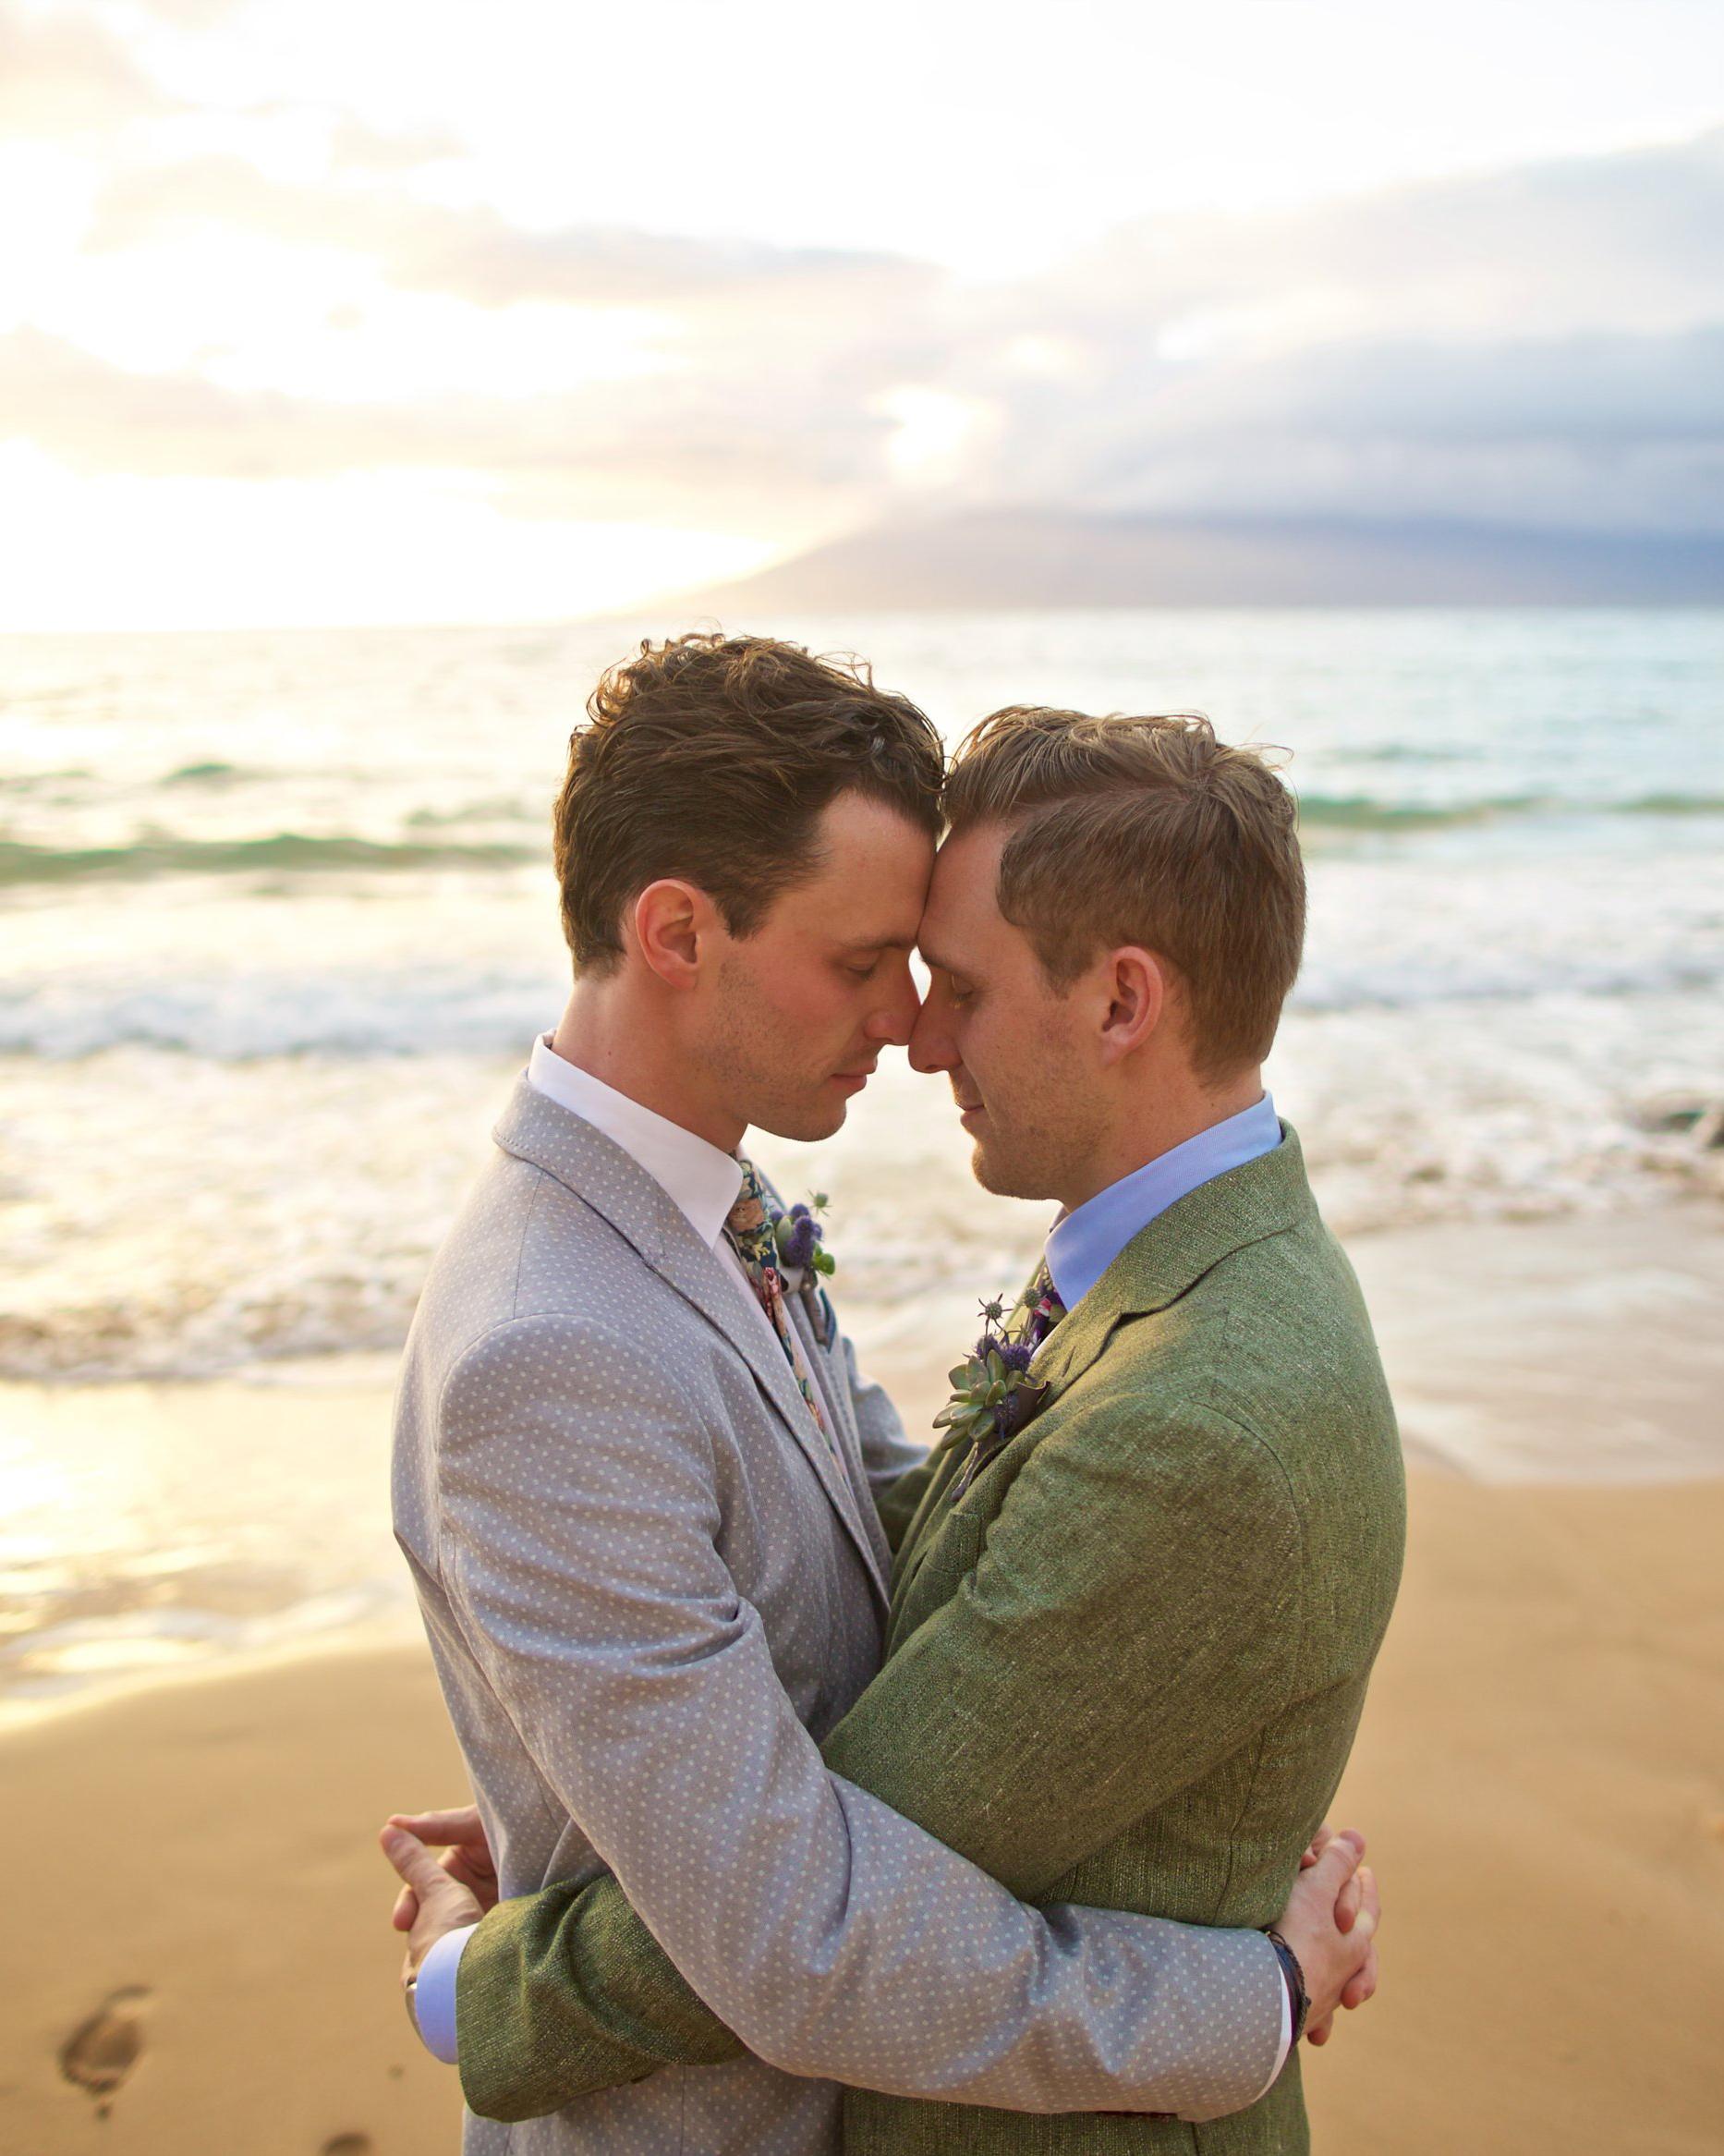 sunset wedding photos grooms embracing on beach